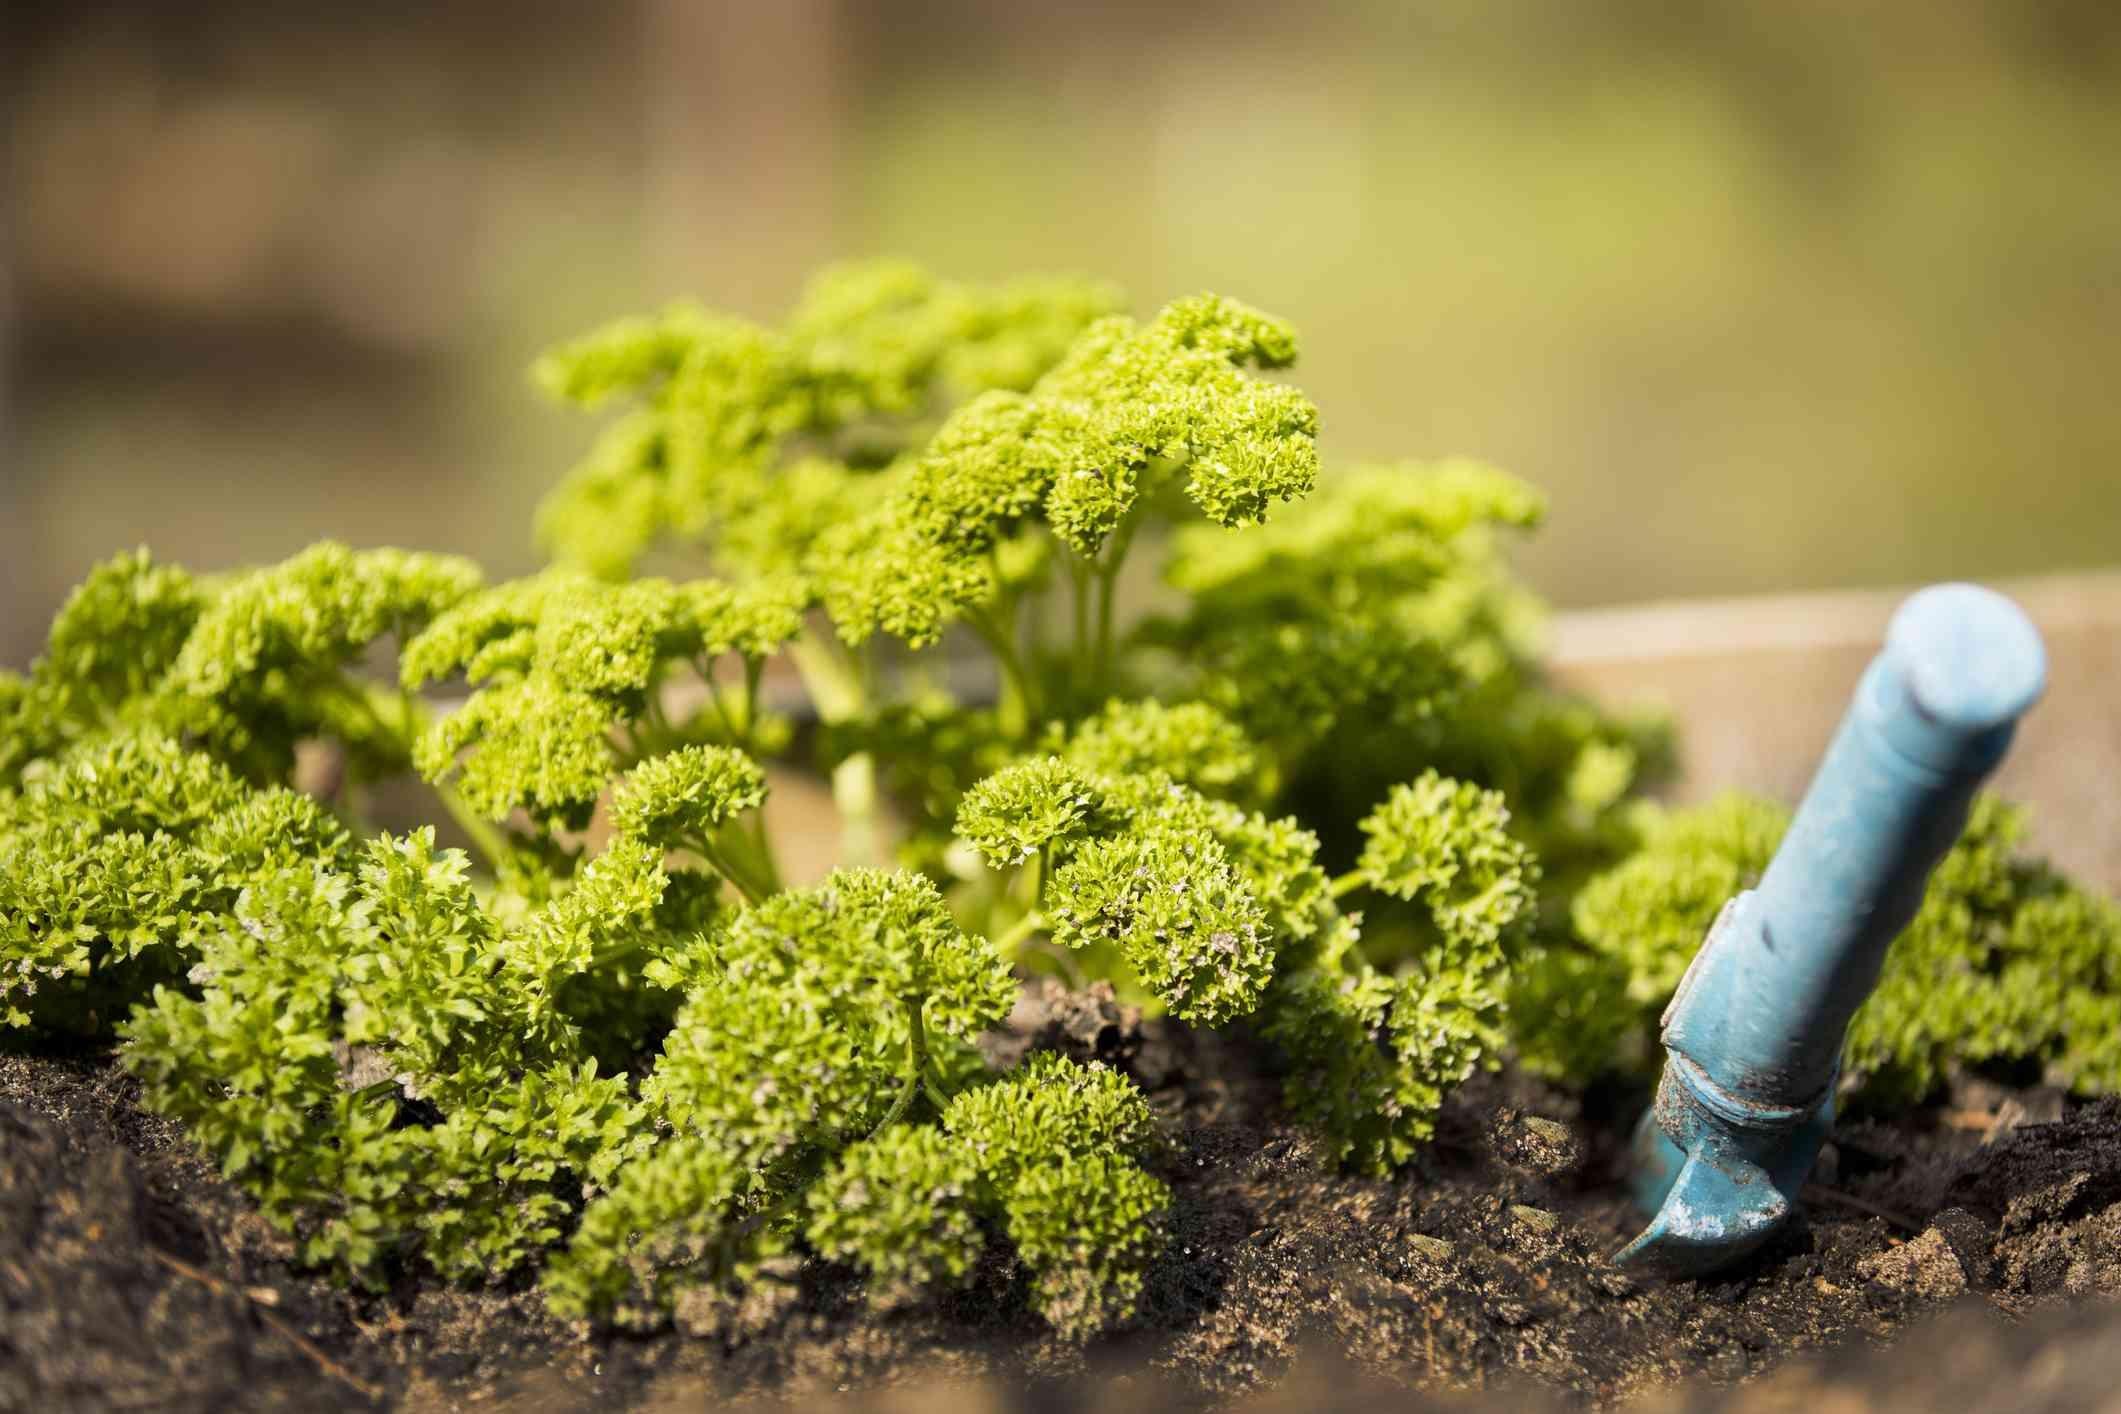 Parsley growing in home herb garden. Vegetables. Healthy living.